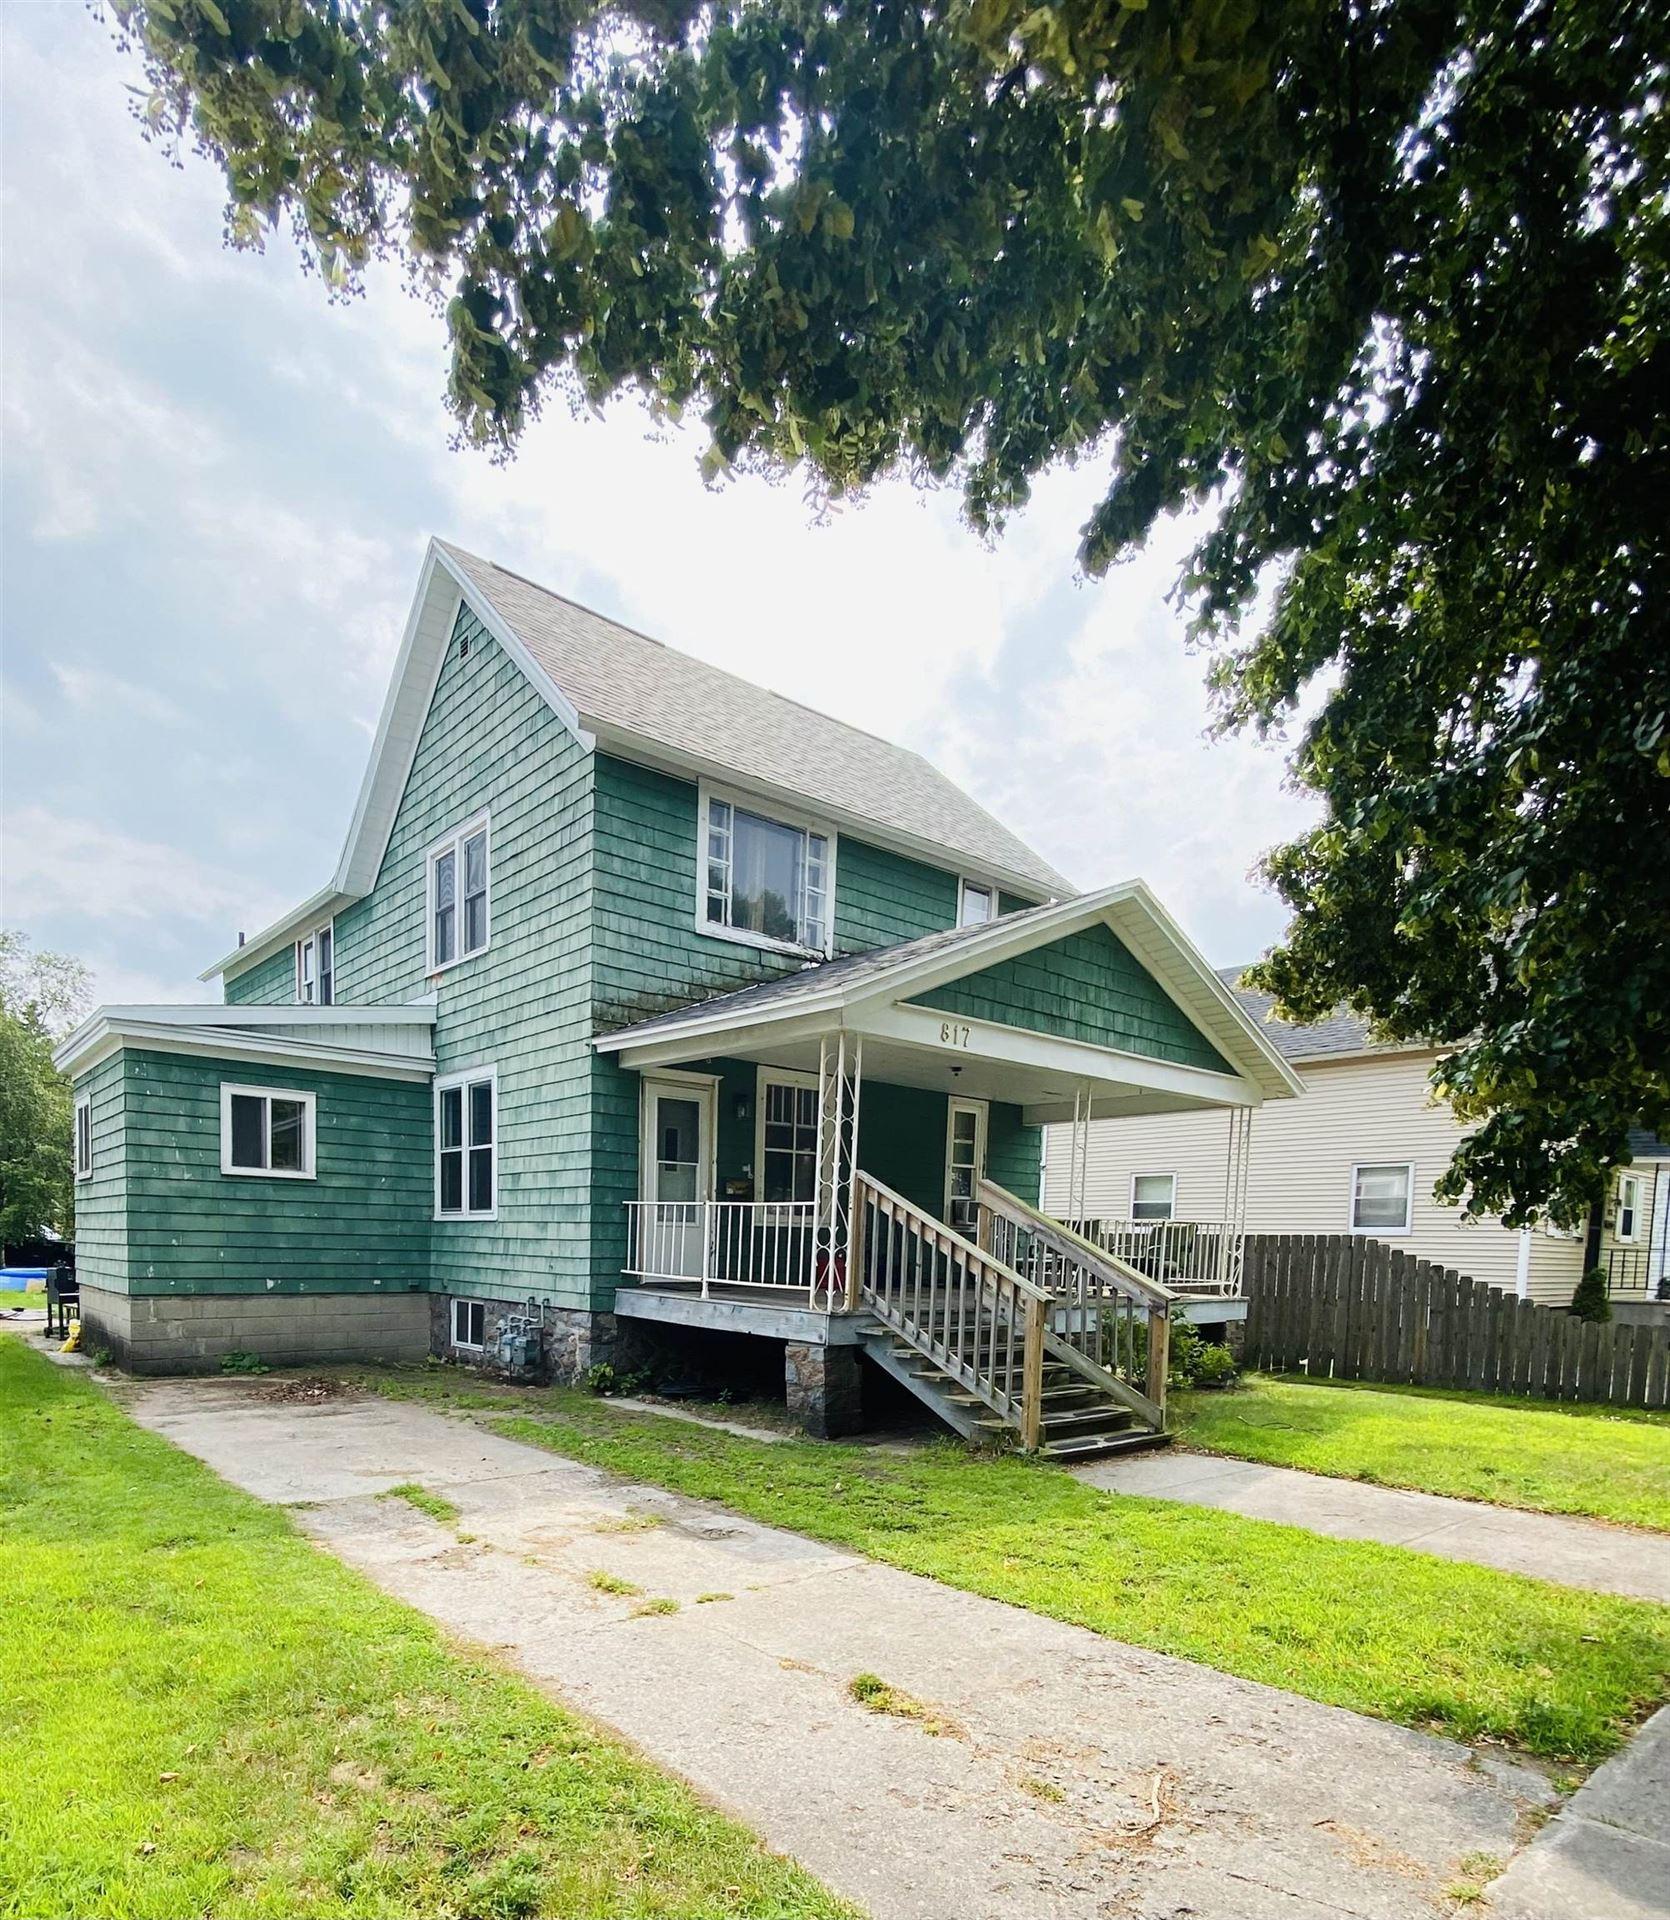 817 PARNELL Street, Marinette, WI 54143 - MLS#: 50249968